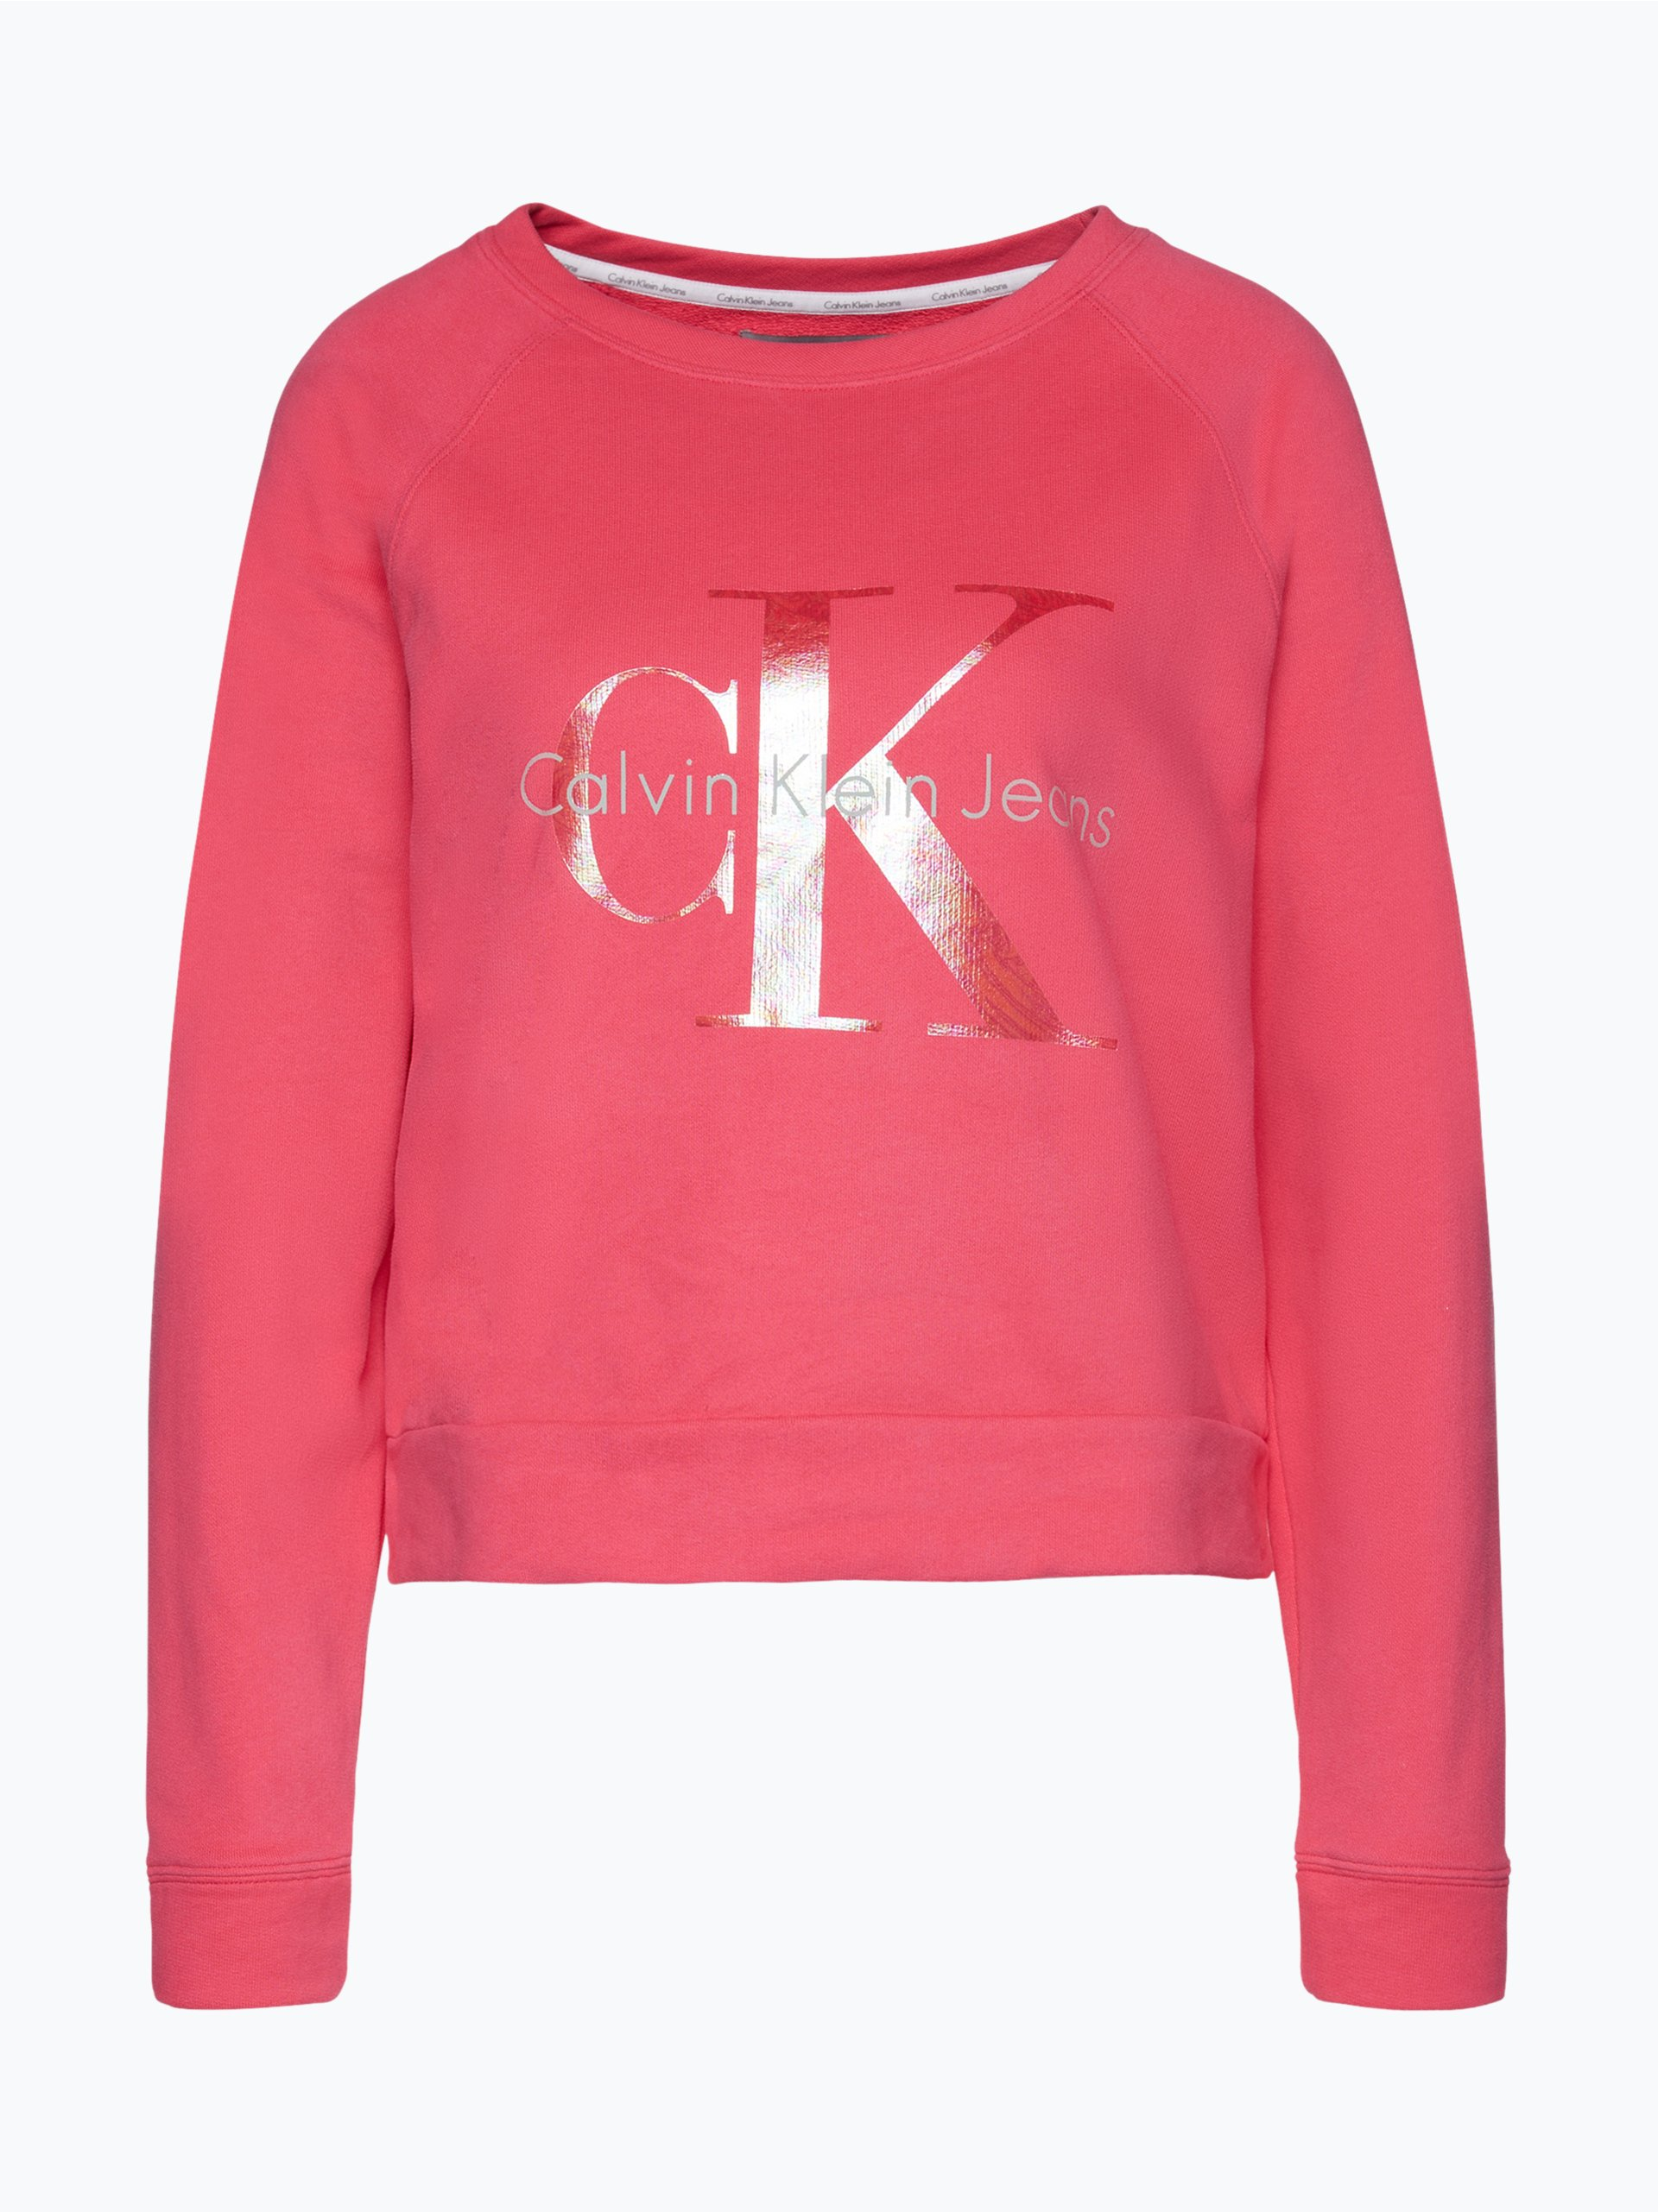 calvin klein jeans damen sweatshirt pink uni online kaufen vangraaf com. Black Bedroom Furniture Sets. Home Design Ideas